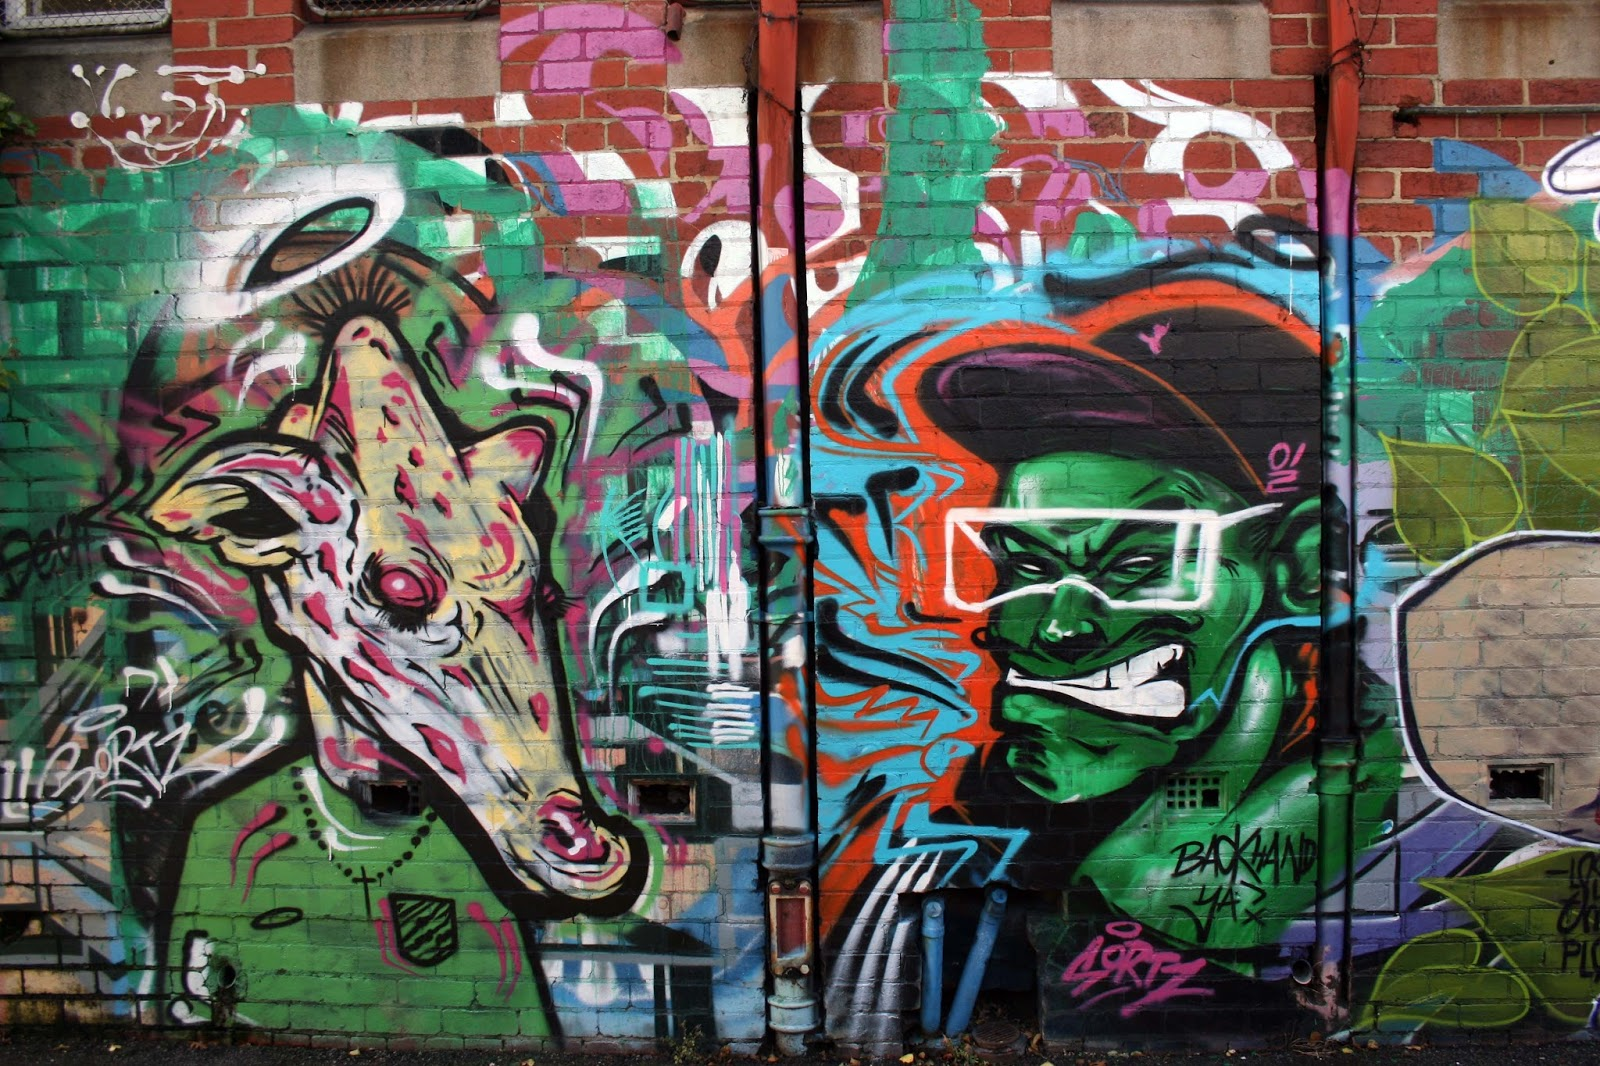 Street Art Melbourne 2017 G Lost The Plot Knock Hancock Putos Shawn Lu Ruskidd Dscreet Sugar Makatron Sicer Shida Senekt Cam Scale Dvate Itch 23rd Key Lush Sortz Gus Wael Graffitis